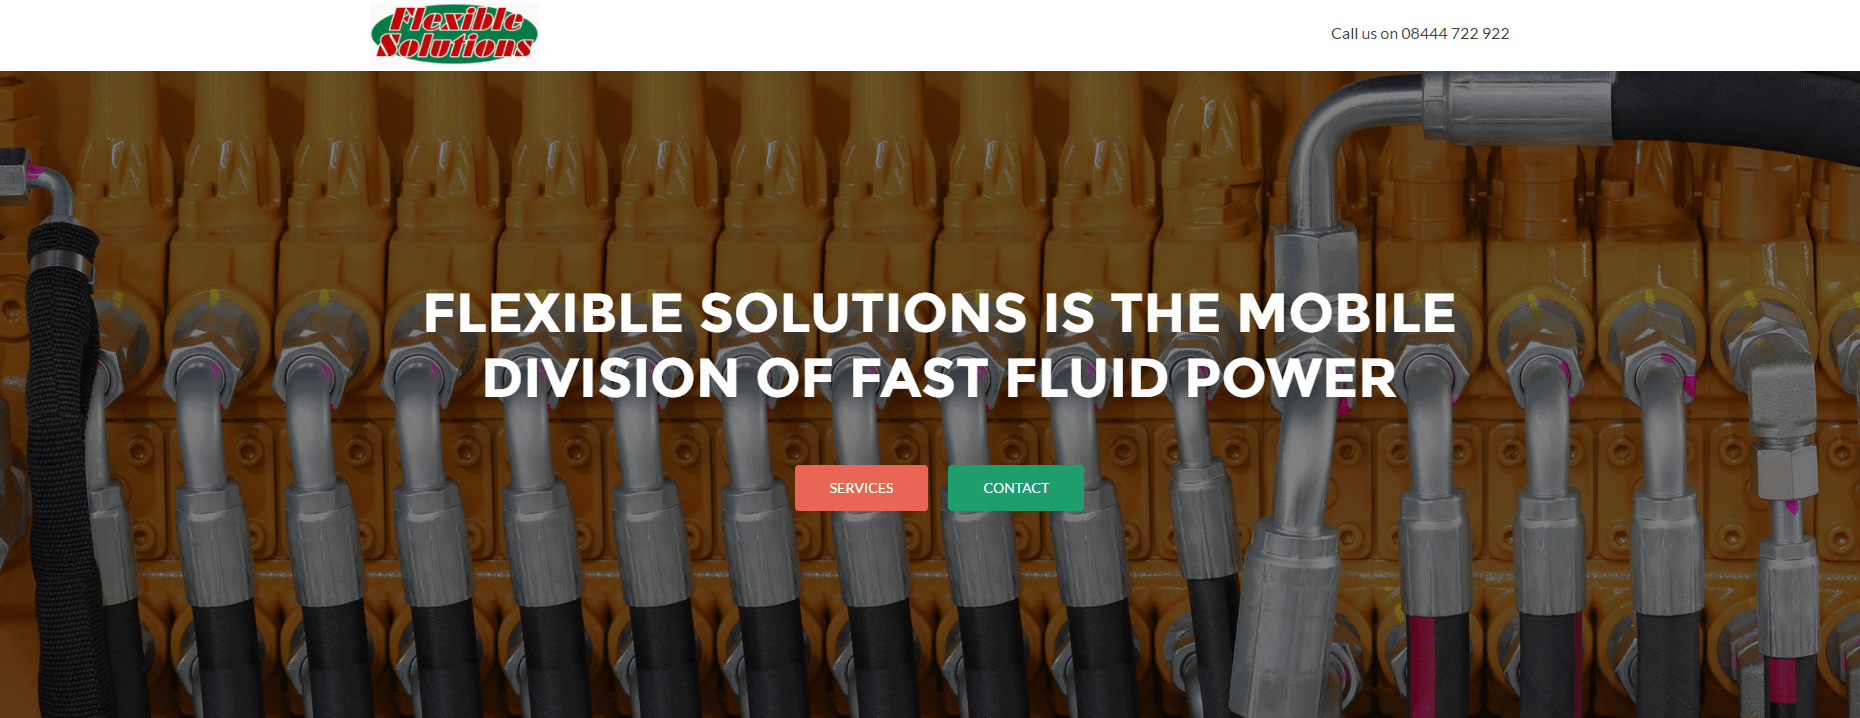 Flexible Solutions